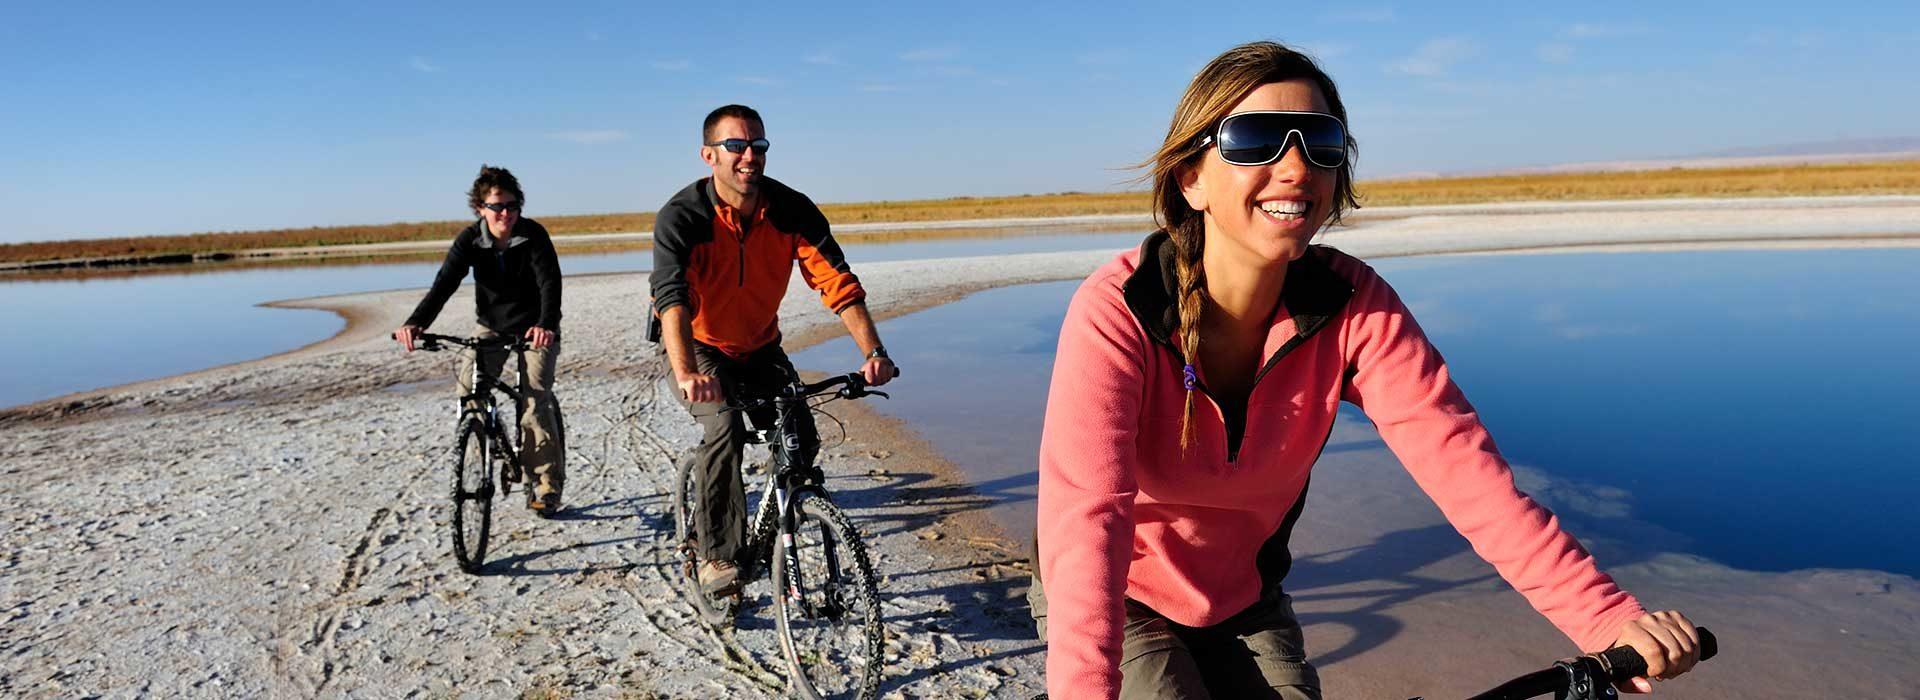 Biking in Atacama Dessert